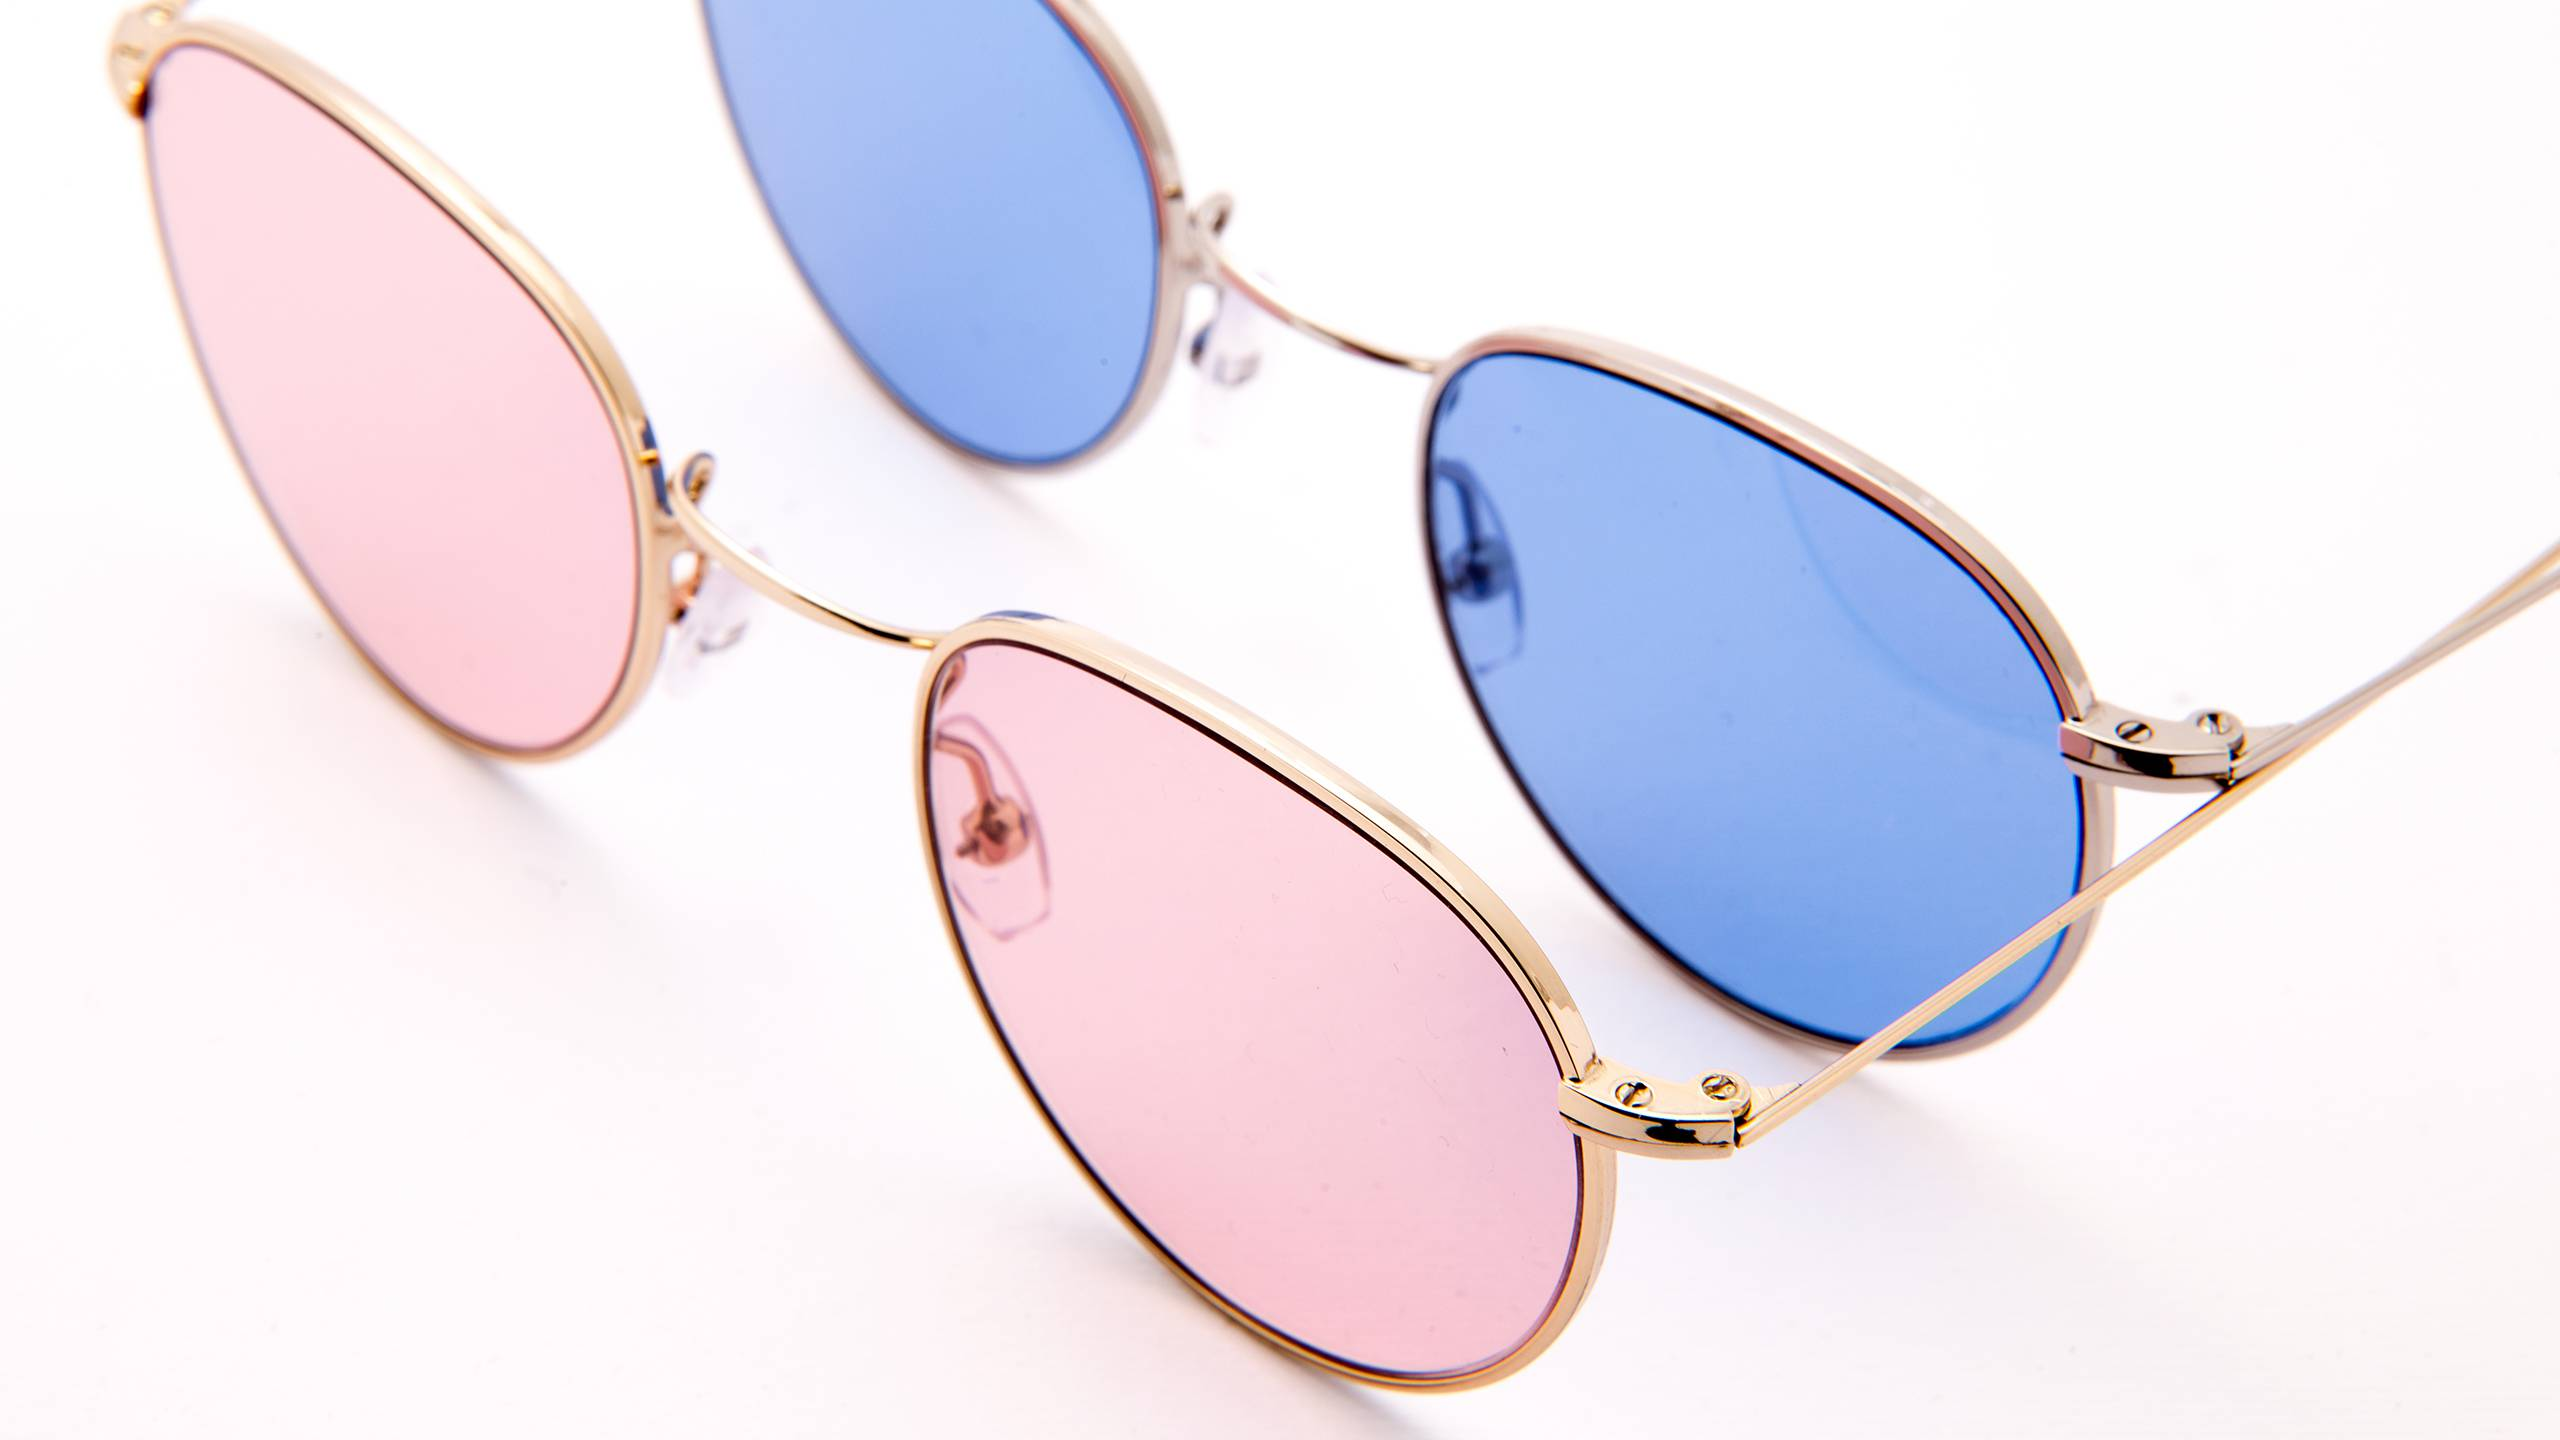 eyeglasses-Nathan-Kaltermann-made-in-Italy-IMG-5956